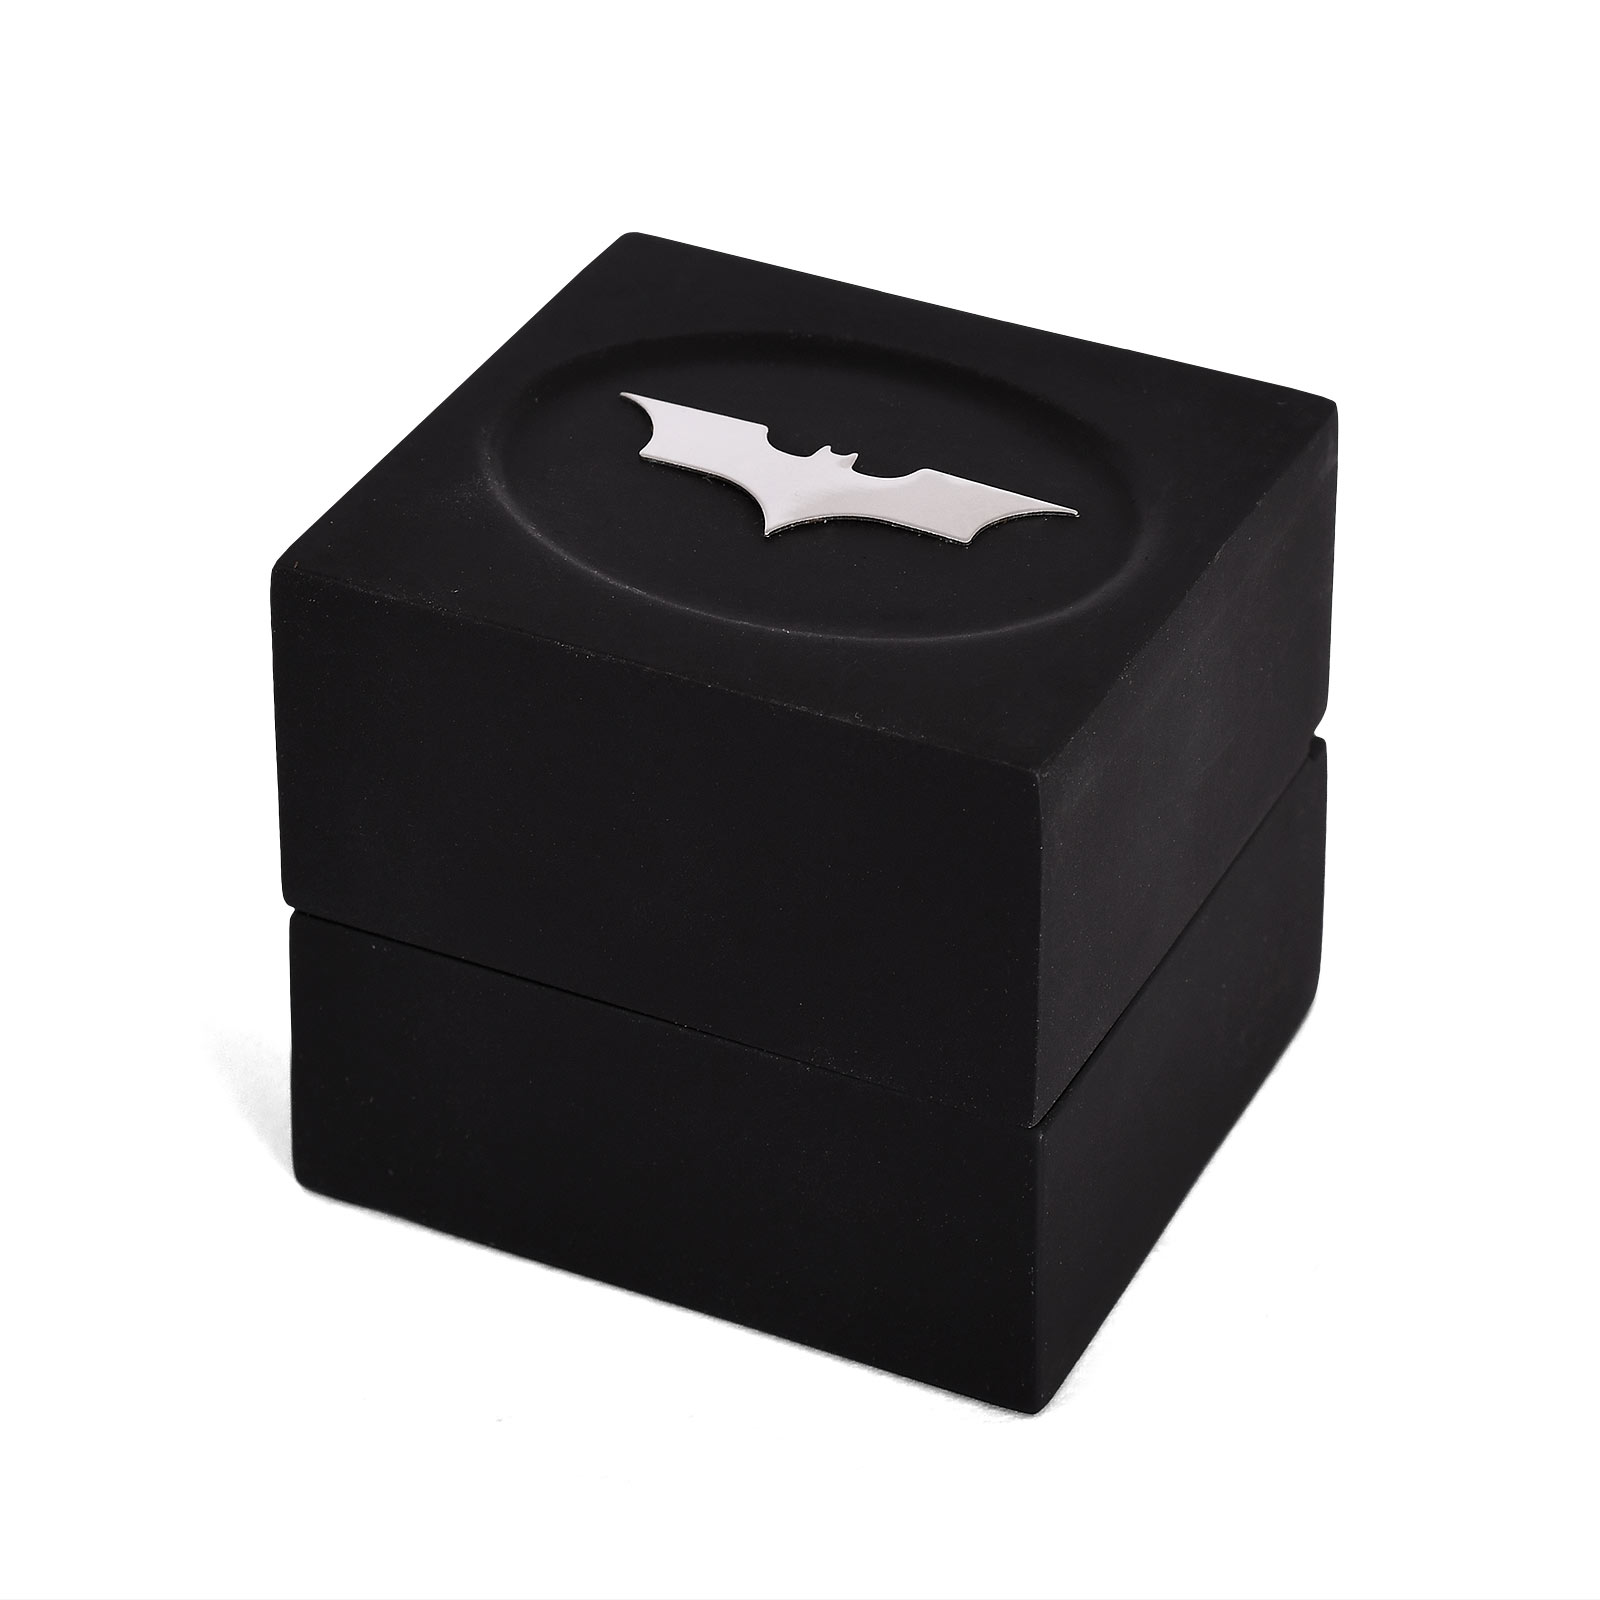 Batman The Dark Knight - Batarang Ring